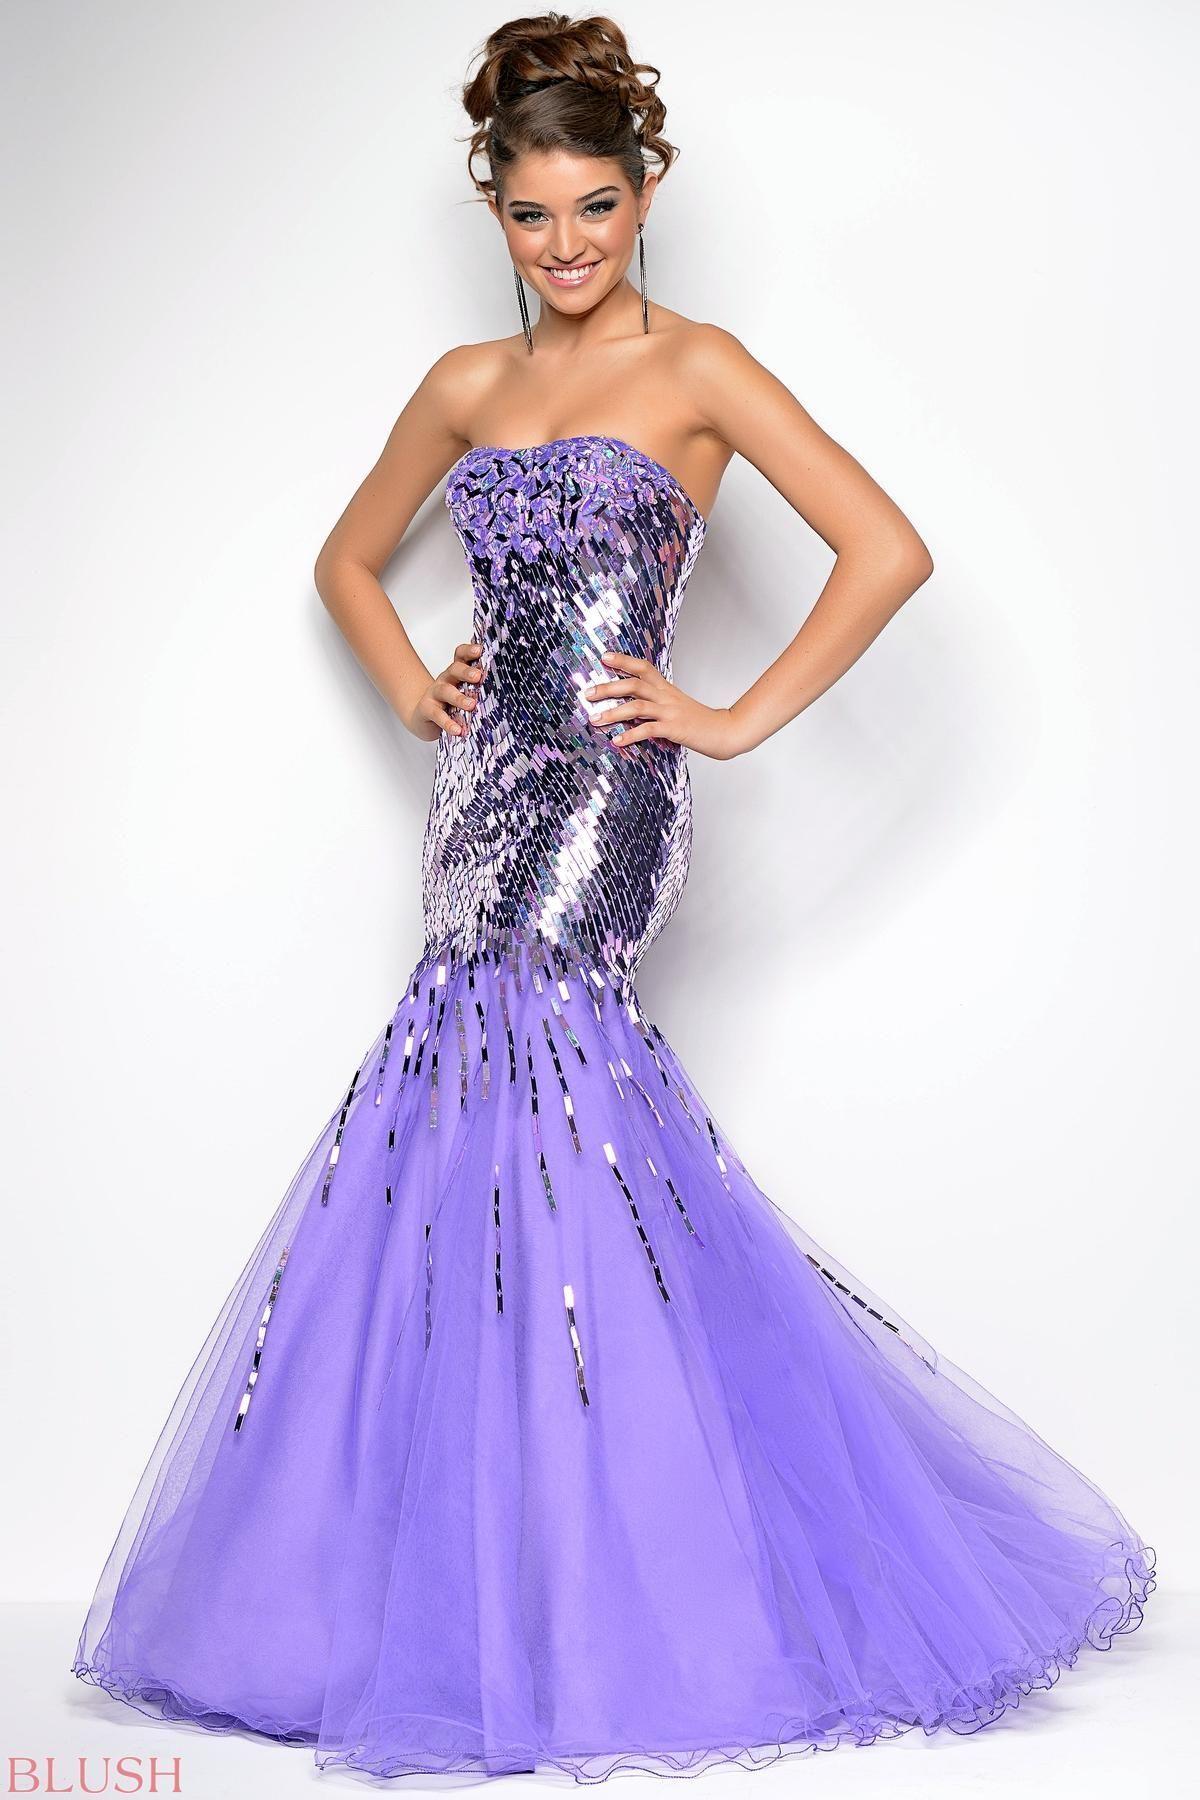 Blushpromdress fashion pinterest blush prom blush